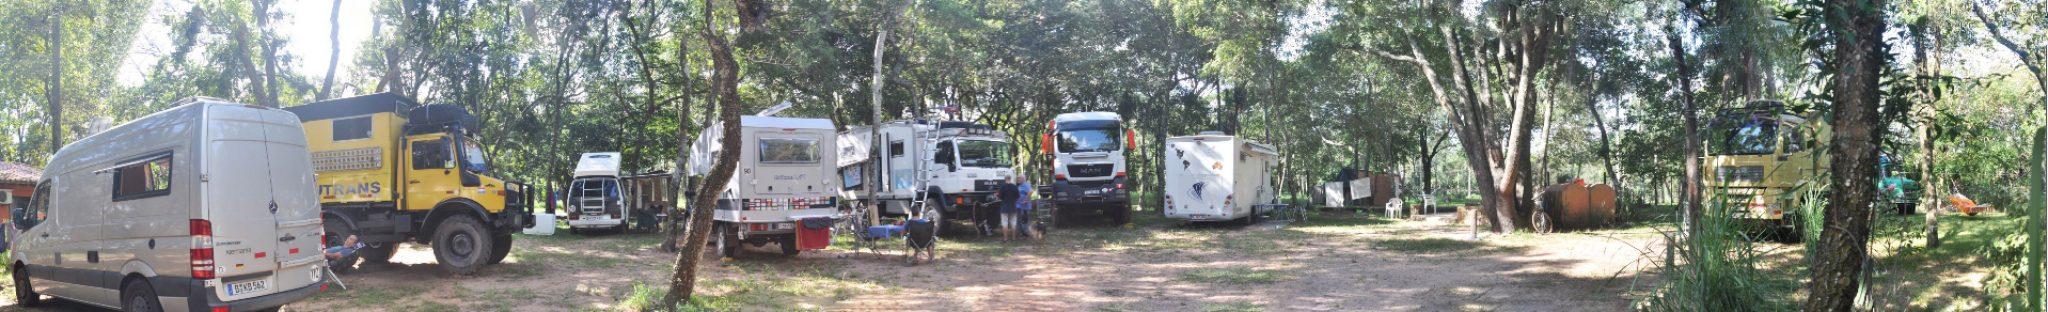 camping paraguay - camping - Paraguay – Im Land der roten Erde